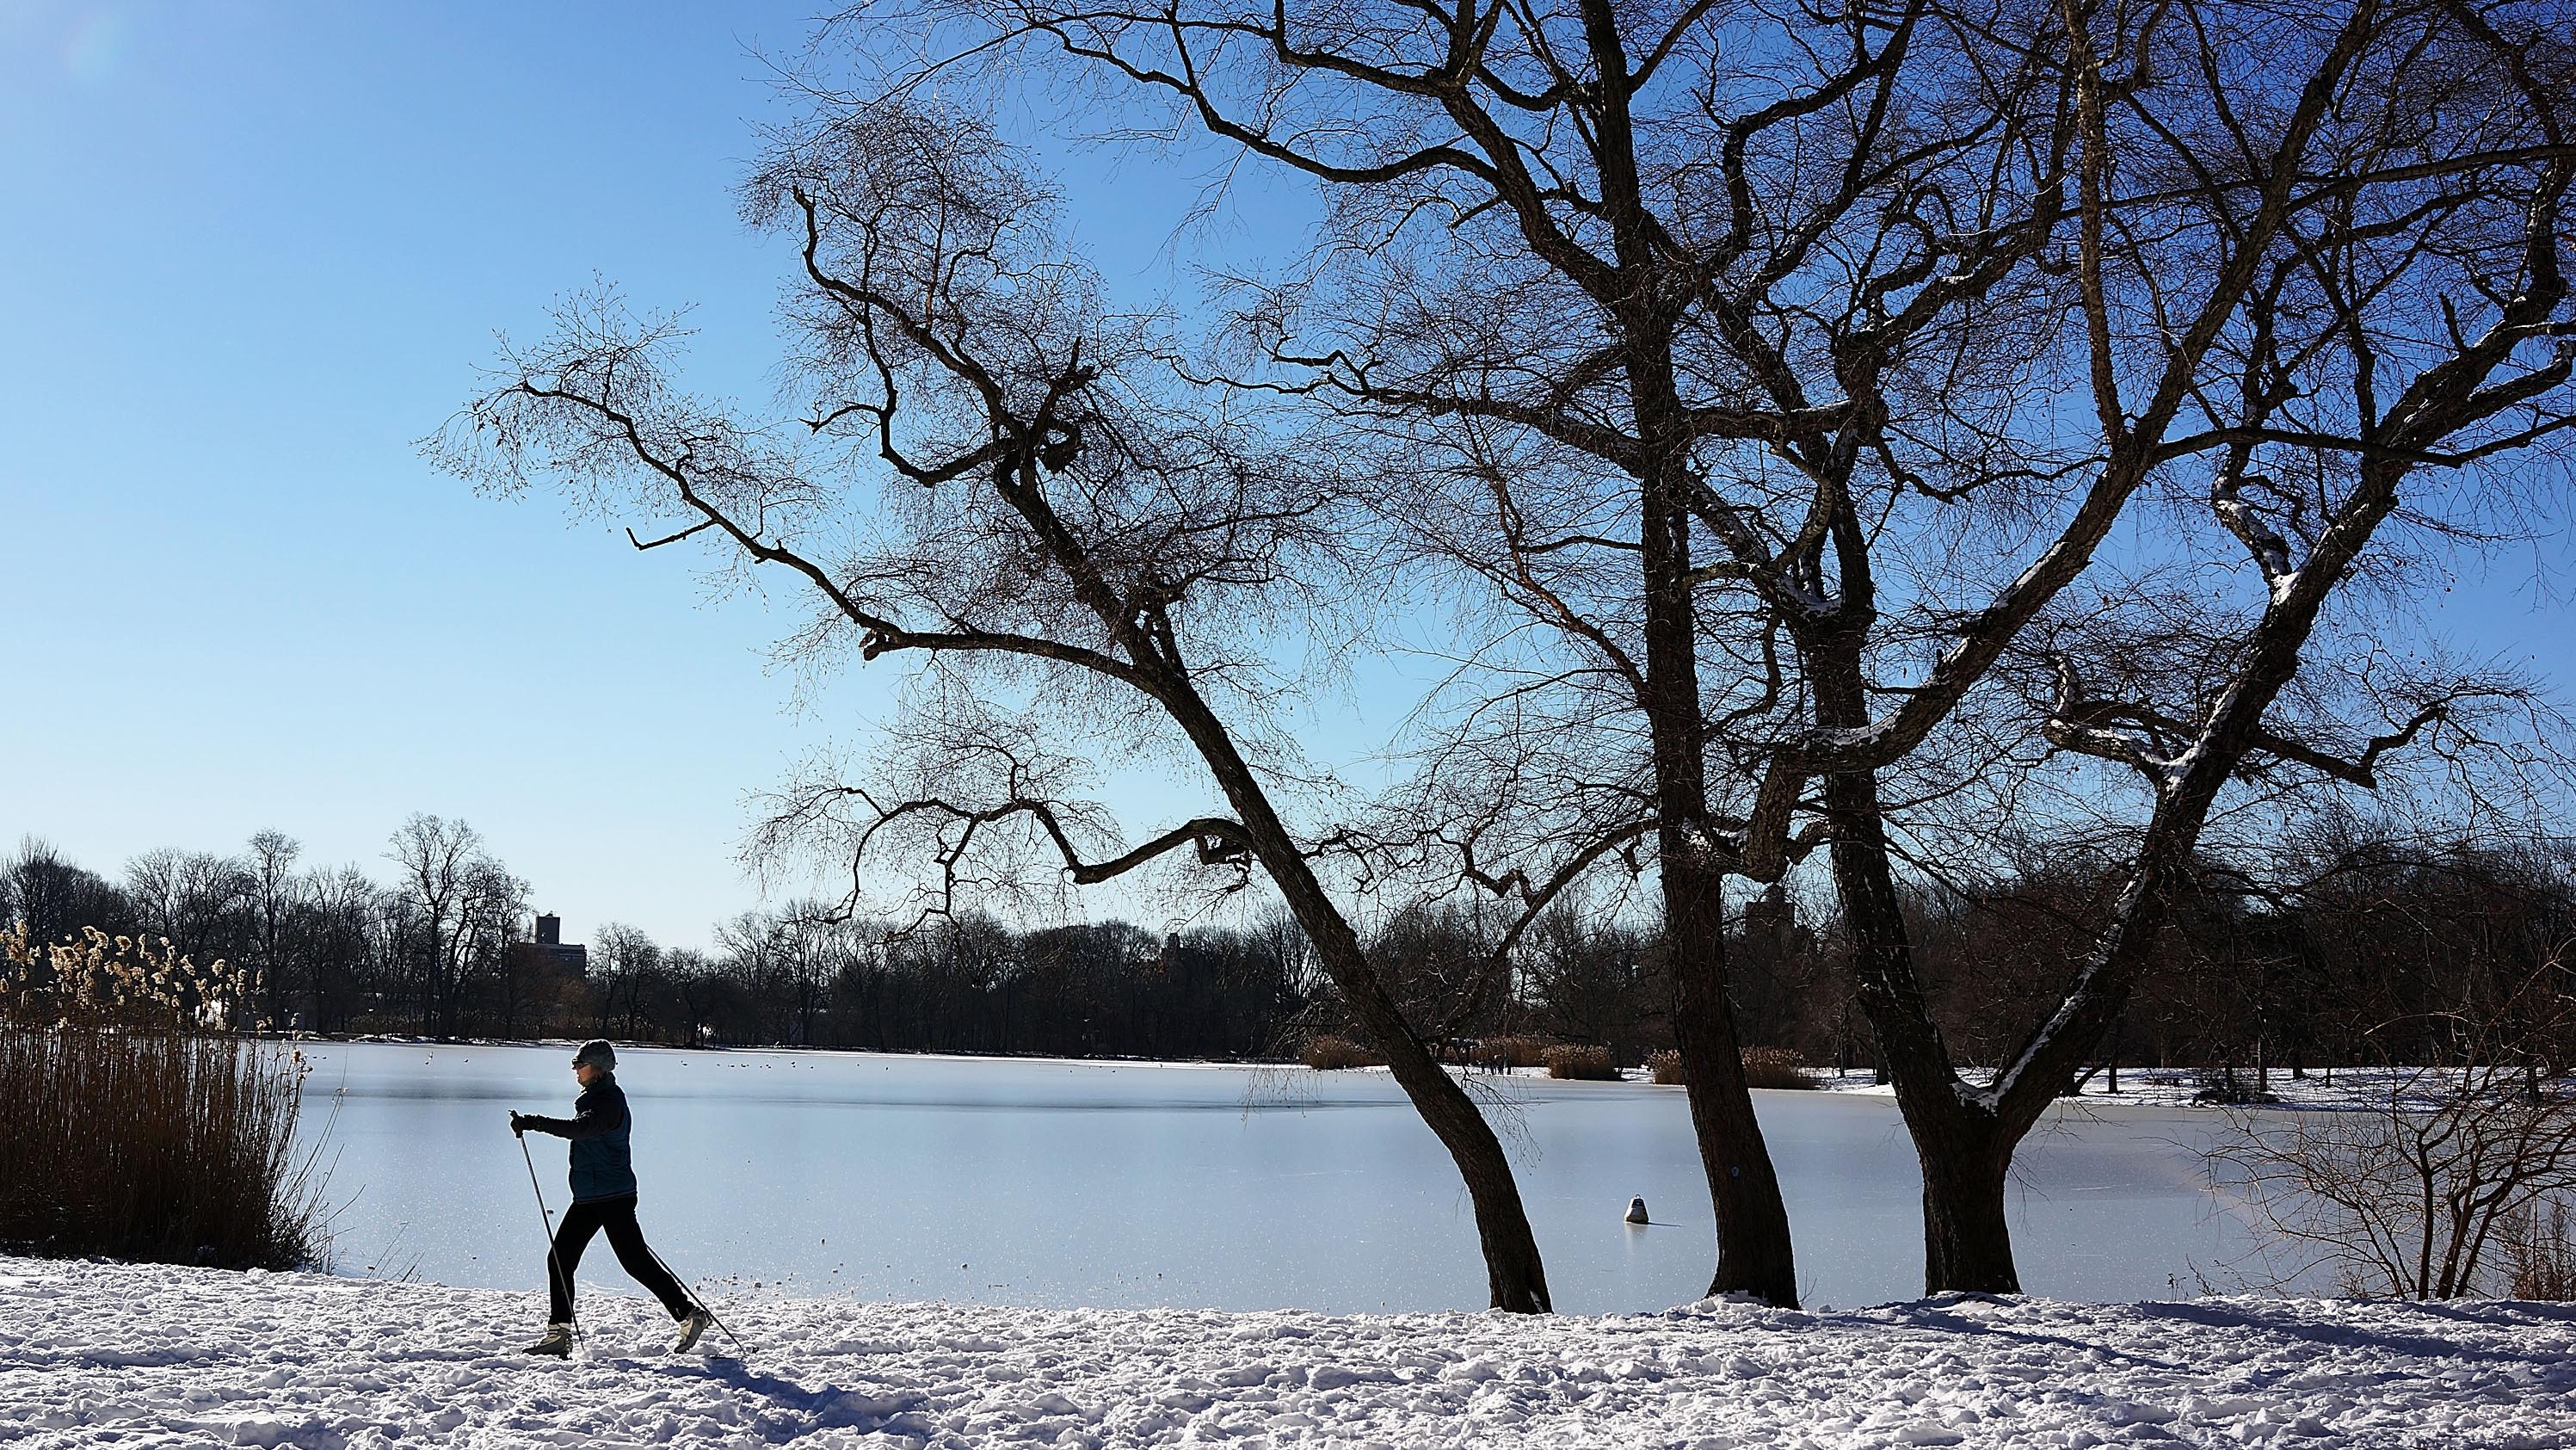 'Polar Vortex' Brings Bitter Cold, Heavy Snow To U.S.